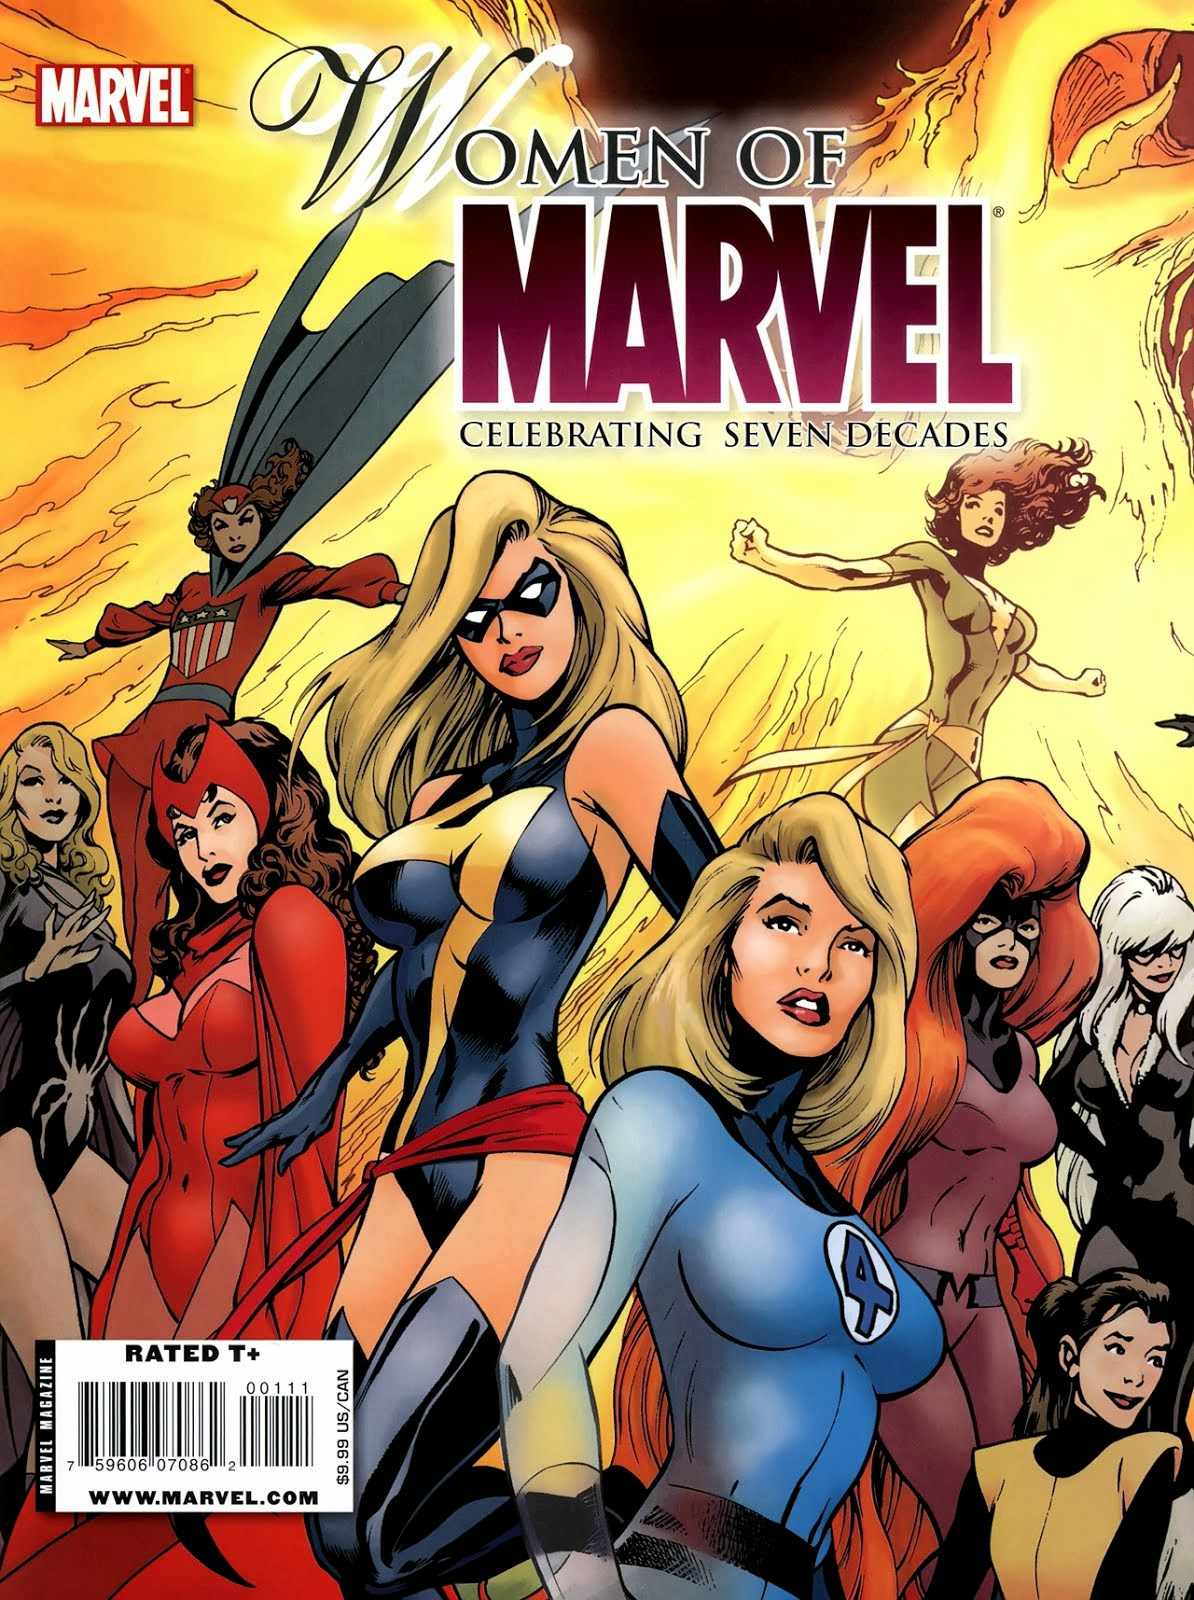 Marvel Magazines